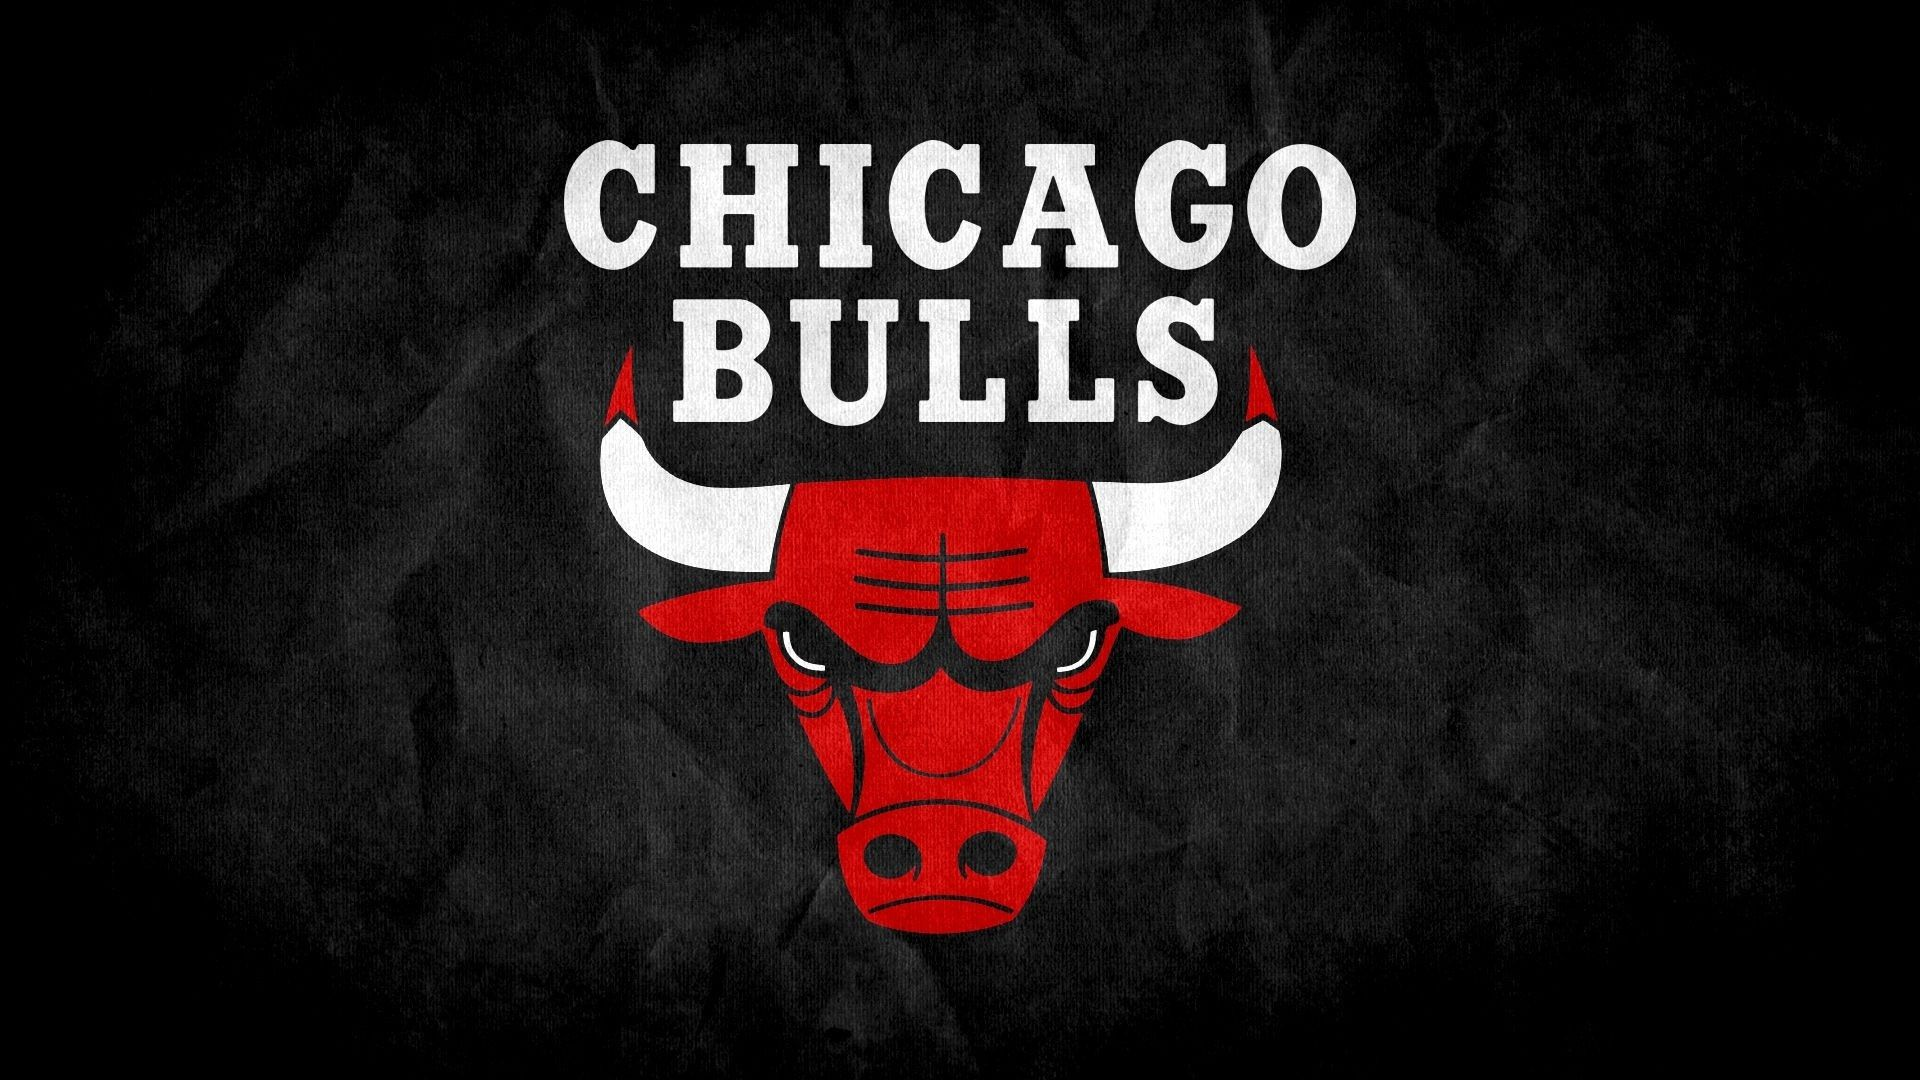 Chicago Bulls Wallpaper Hd Chicago Bulls Logo Chicago Bulls Wallpaper Chicago Bulls Team